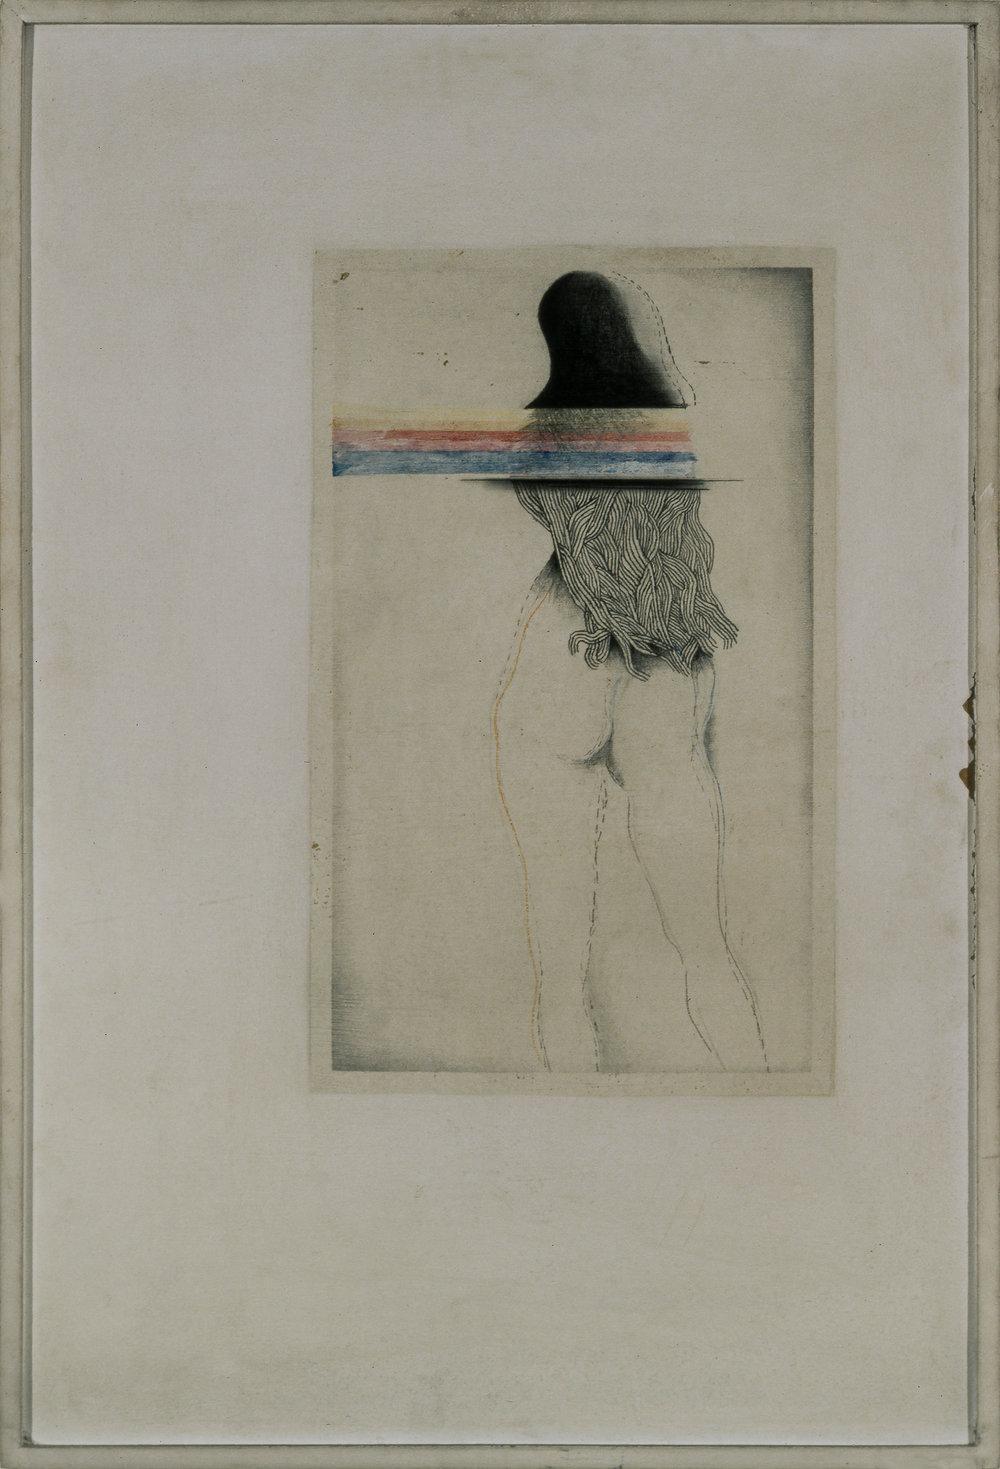 Untitled, Mixed media on board 50.8 x 76.2 cm c. 1970. Courtesy of Nurjahan Akhlaq. Photography Asif Khan & Richard Seck.